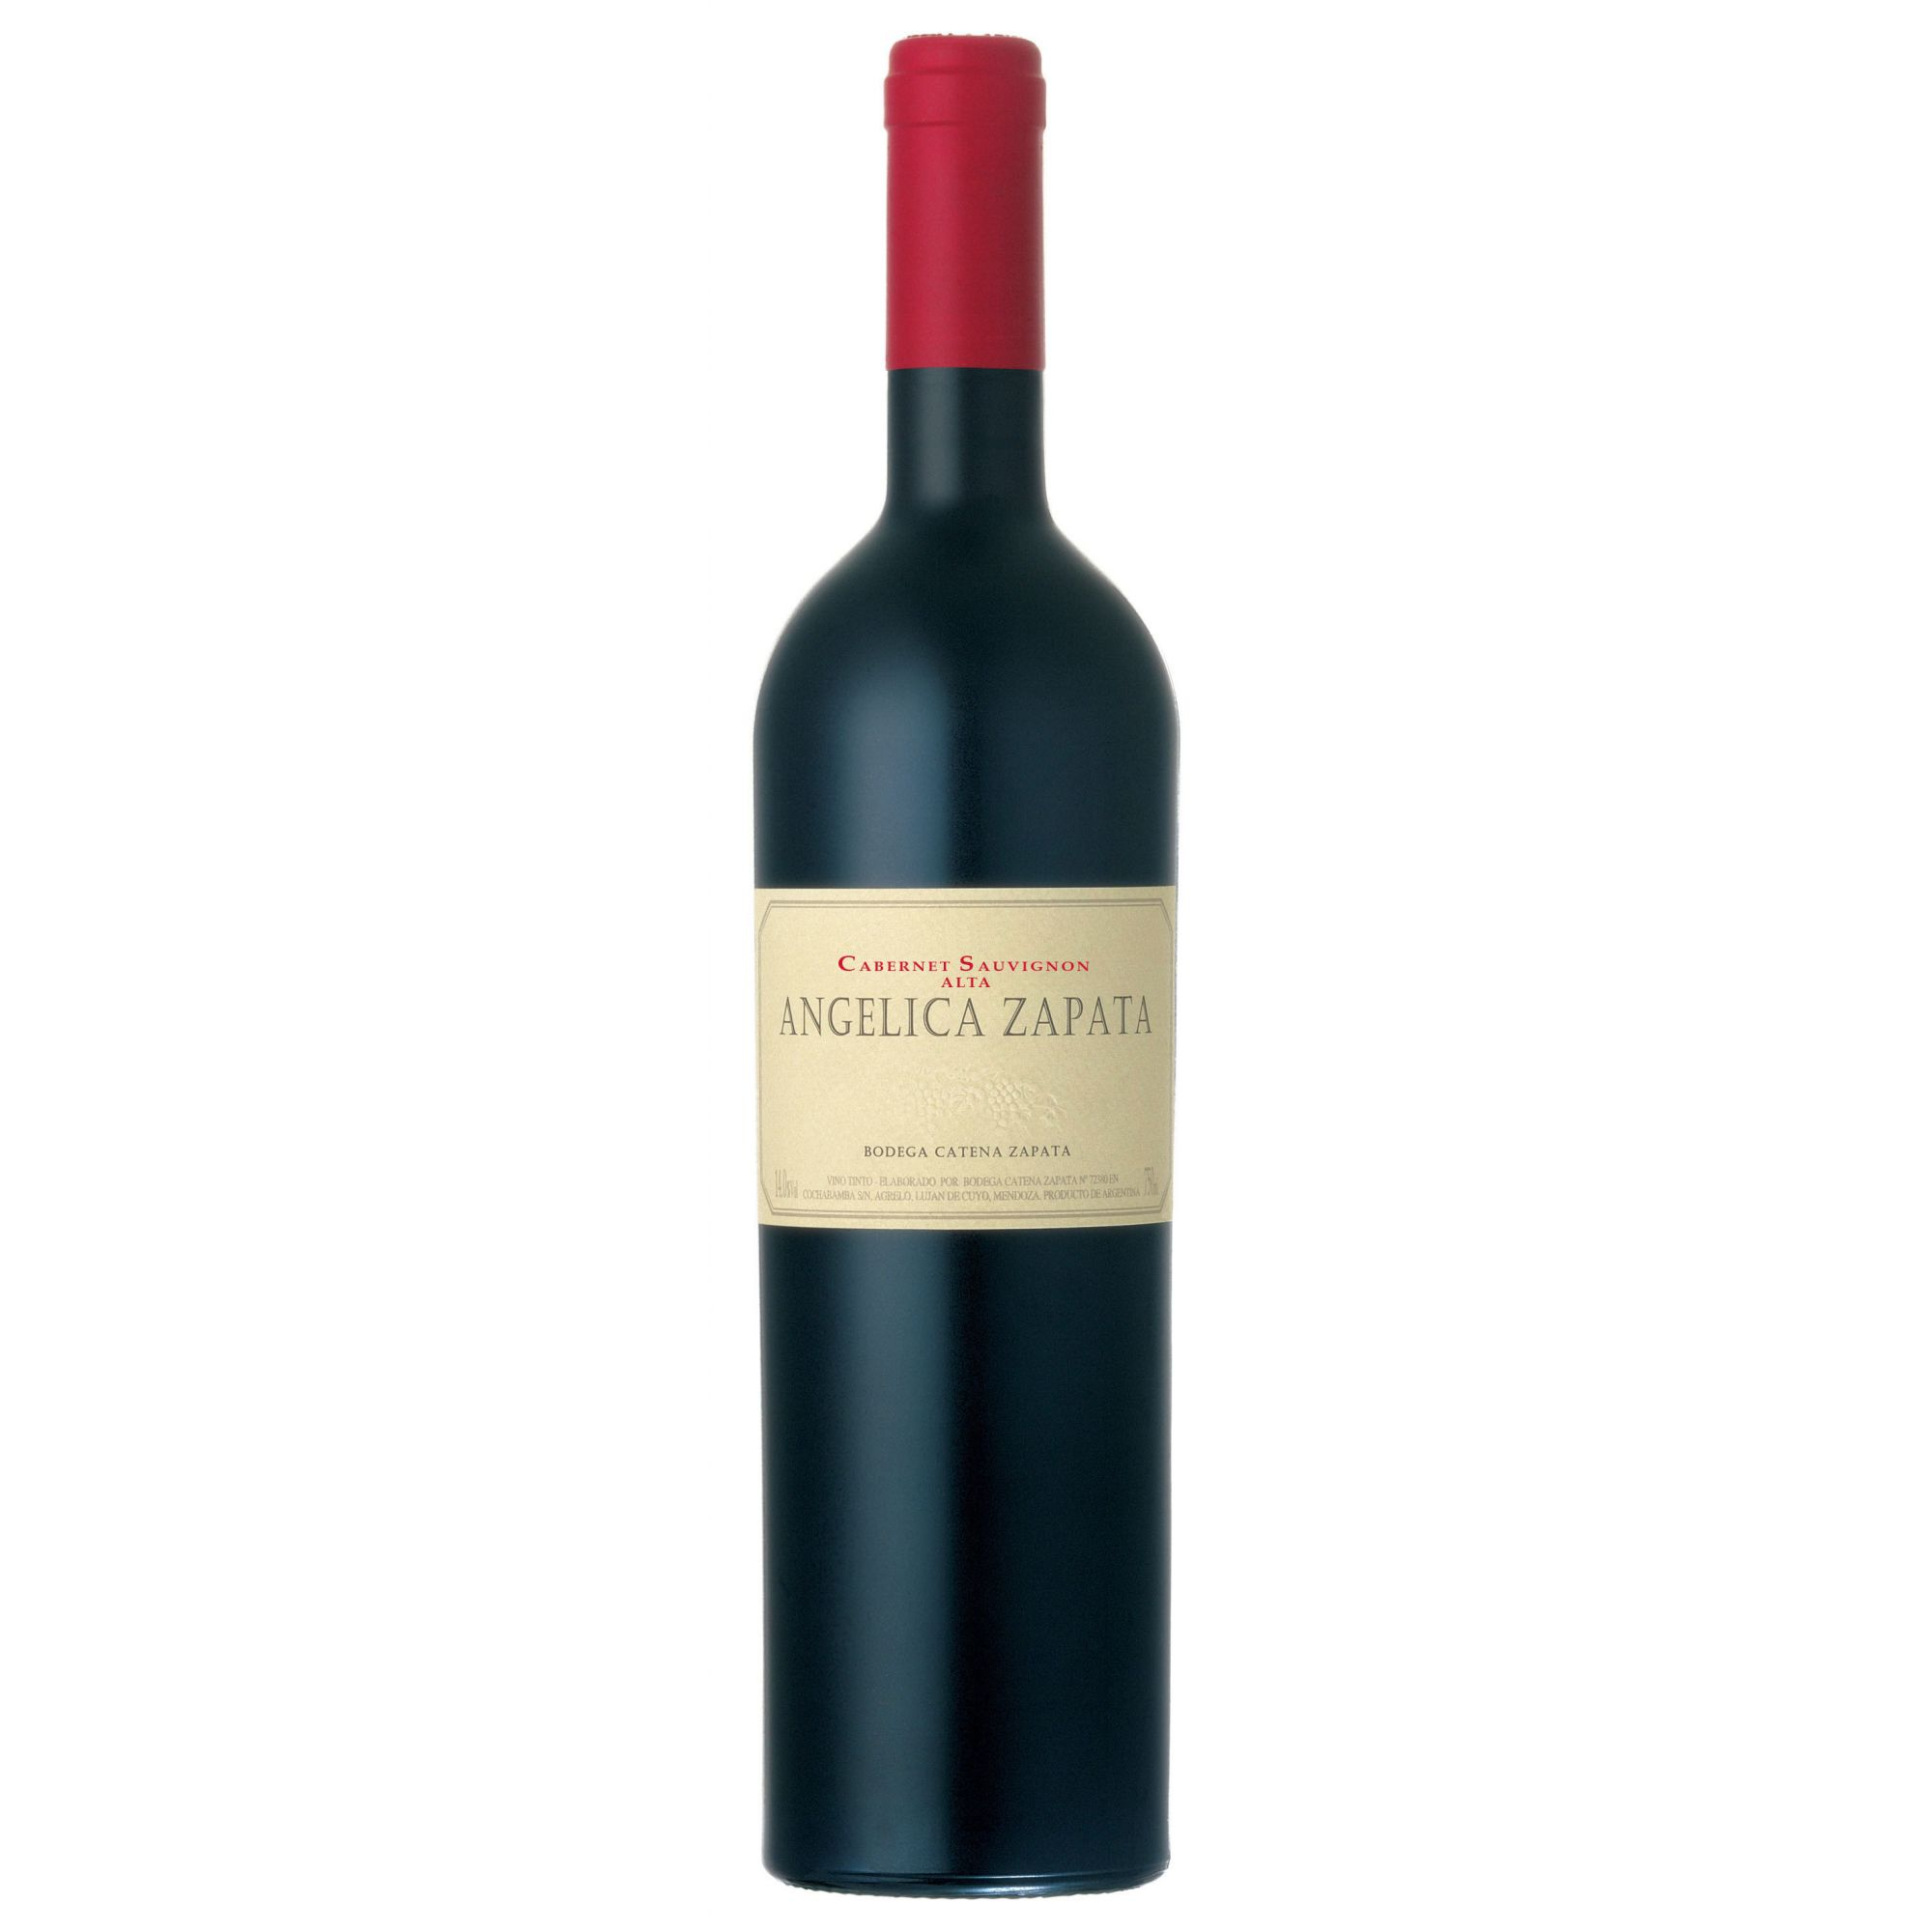 Vinho Angelica Zapata Cabernet Sauvignon